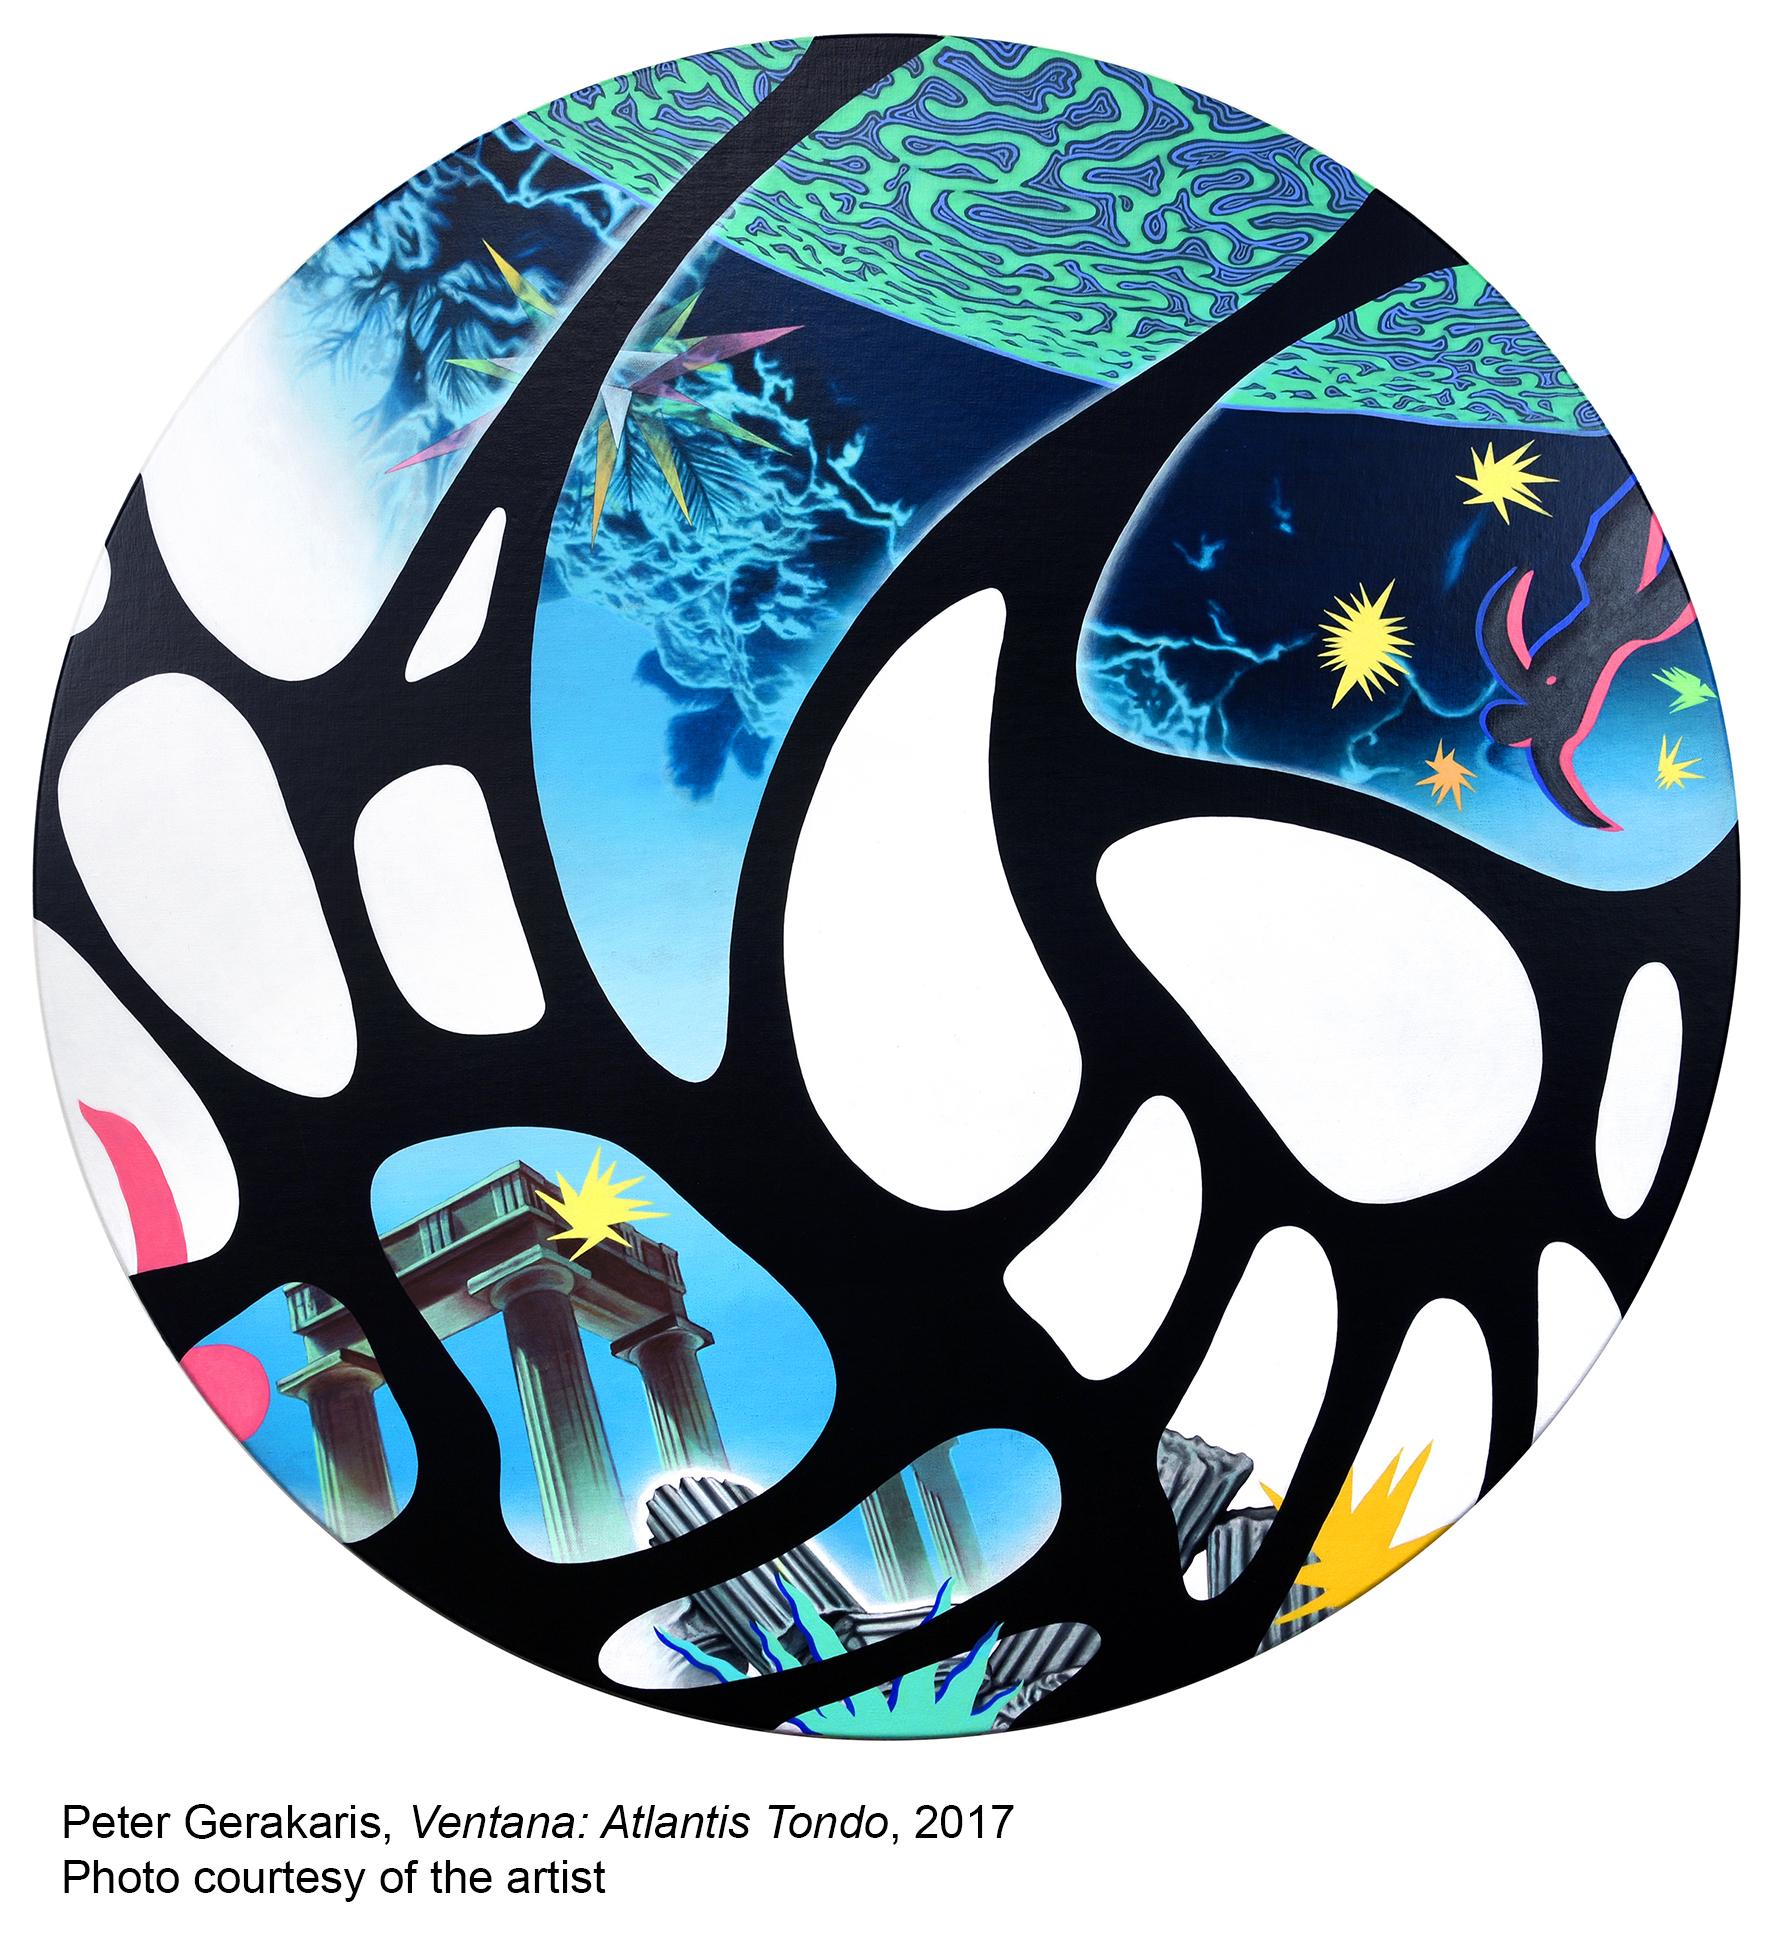 03-Gerakaris-Peter_Ventana-Atlantis-Tondo_2017_title.jpg